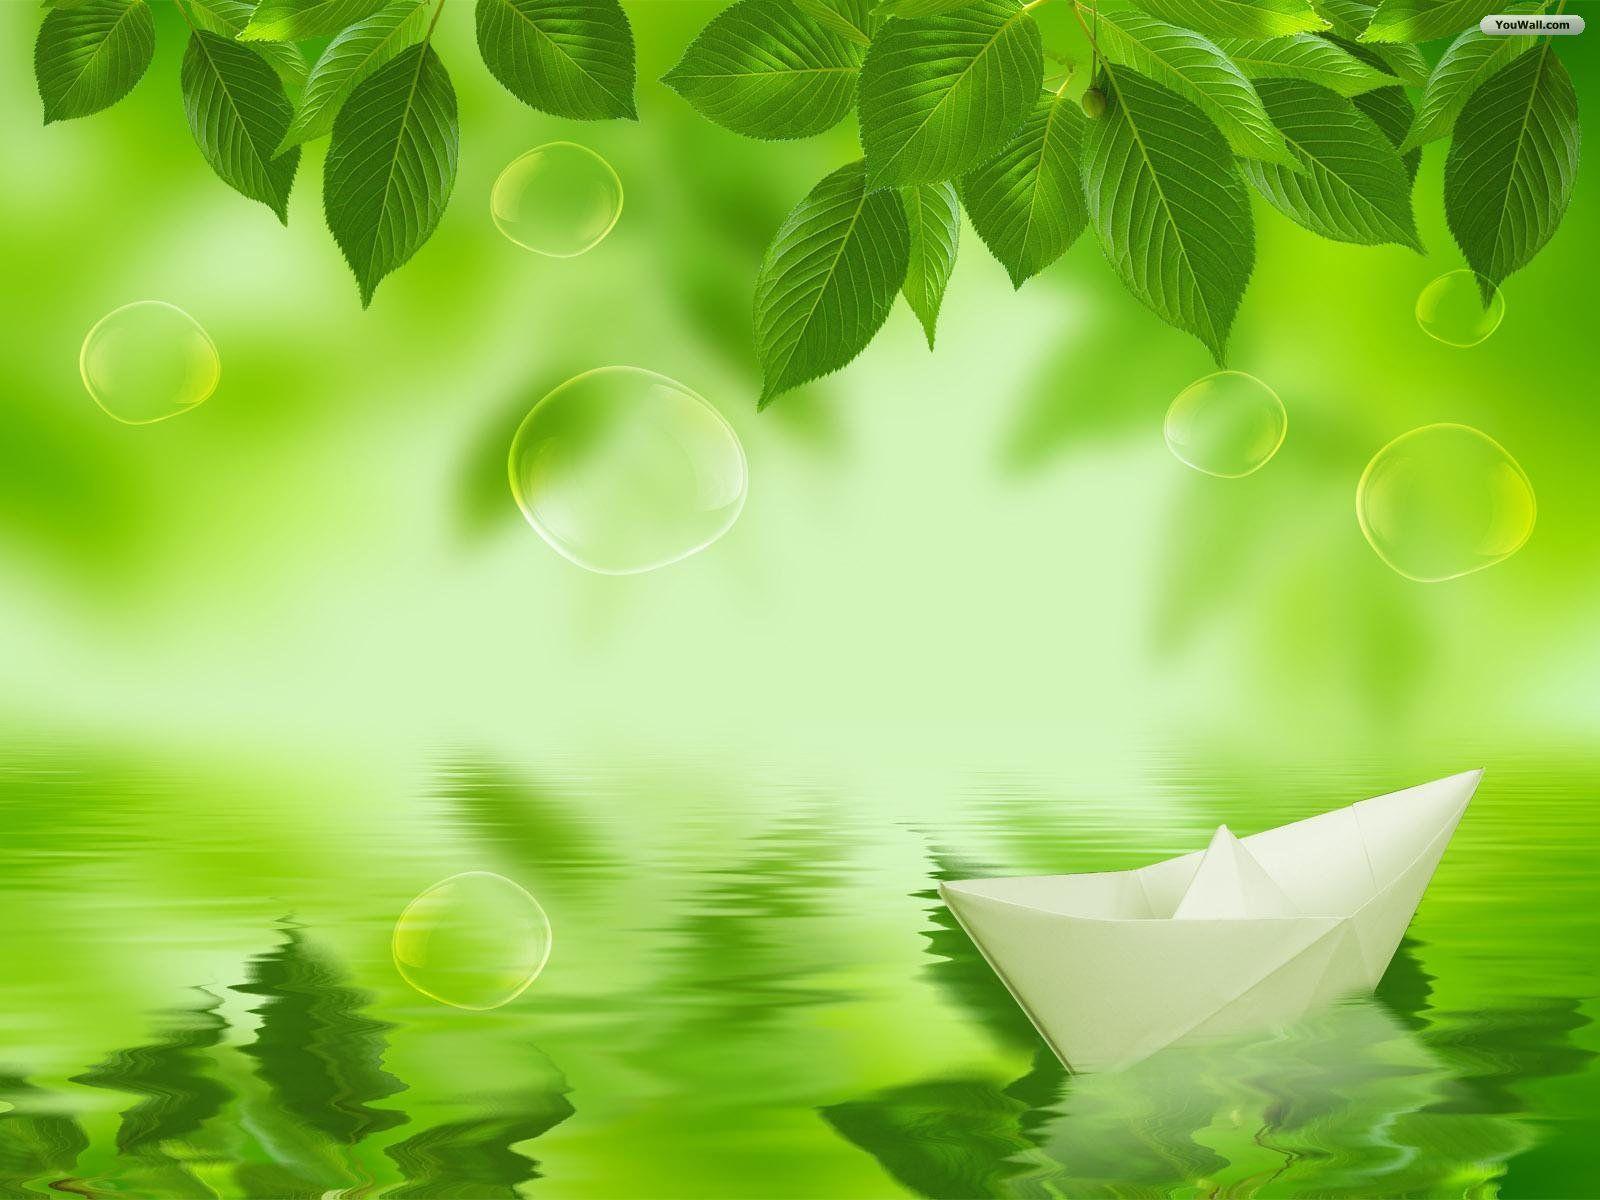 Pin By Sharifkhan On Green Green Leaf Wallpaper Green Nature Green Wallpaper